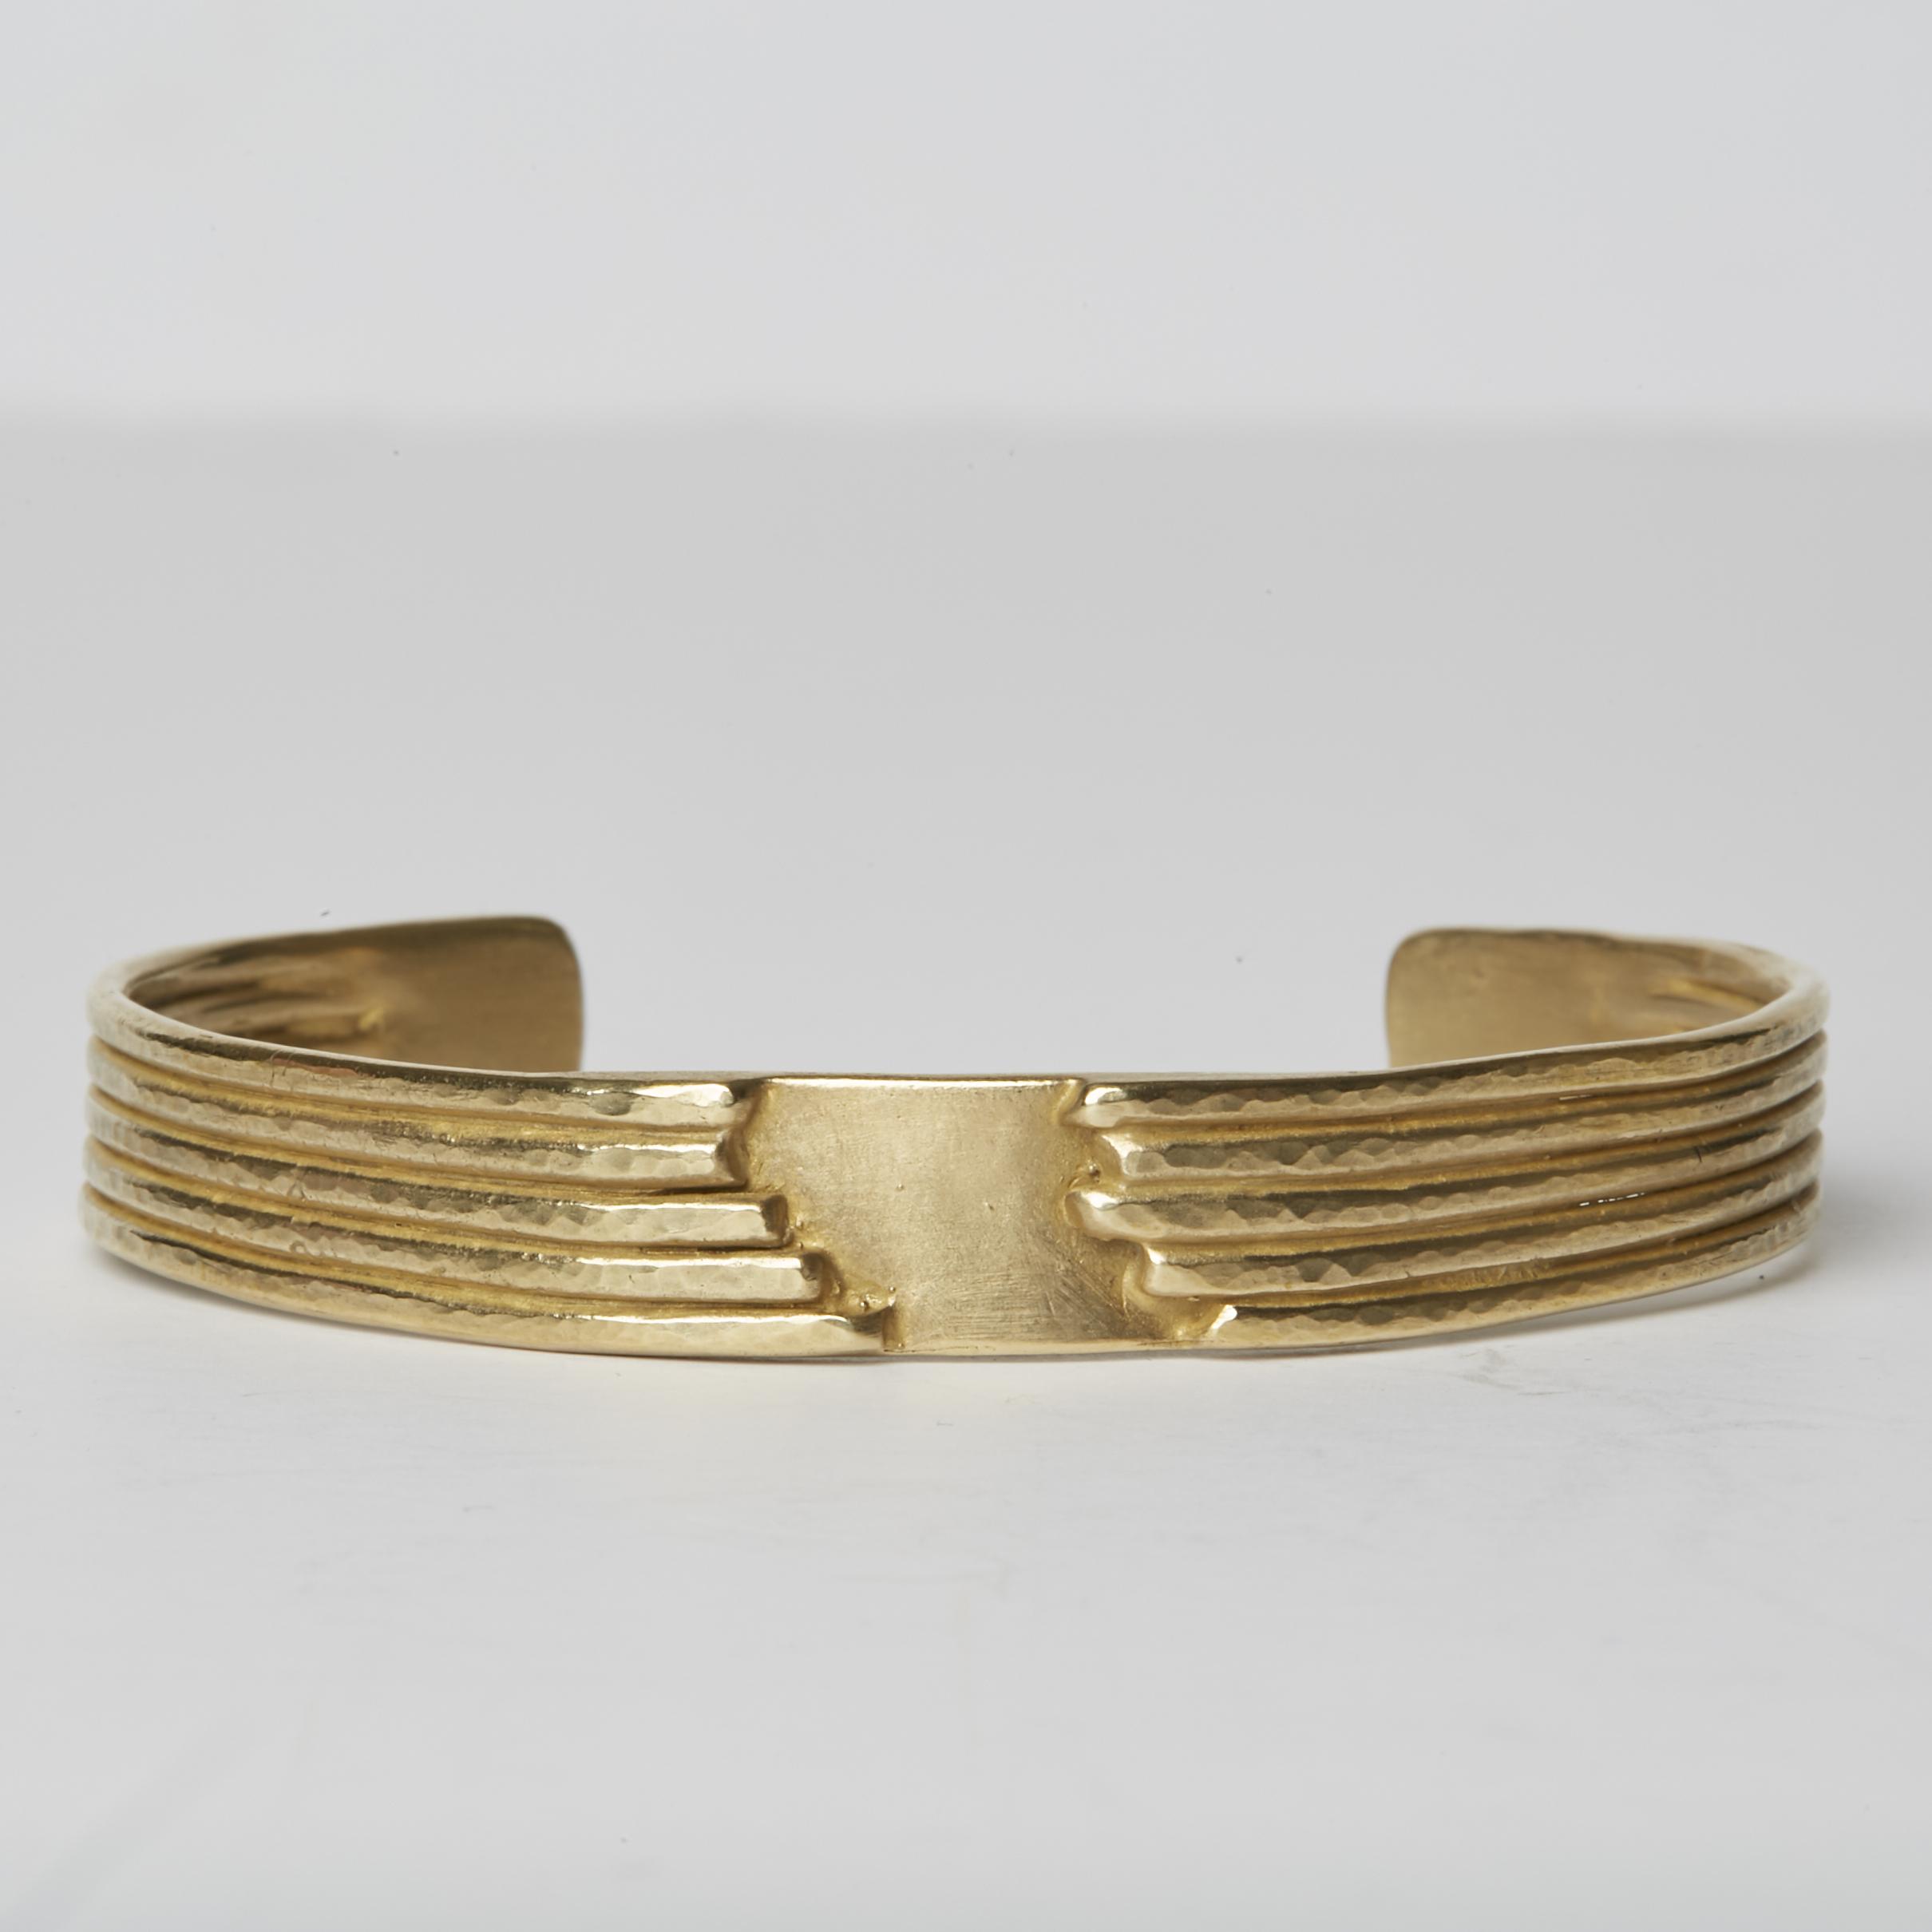 20181029_SonjaFries_Jewelry5767.jpg